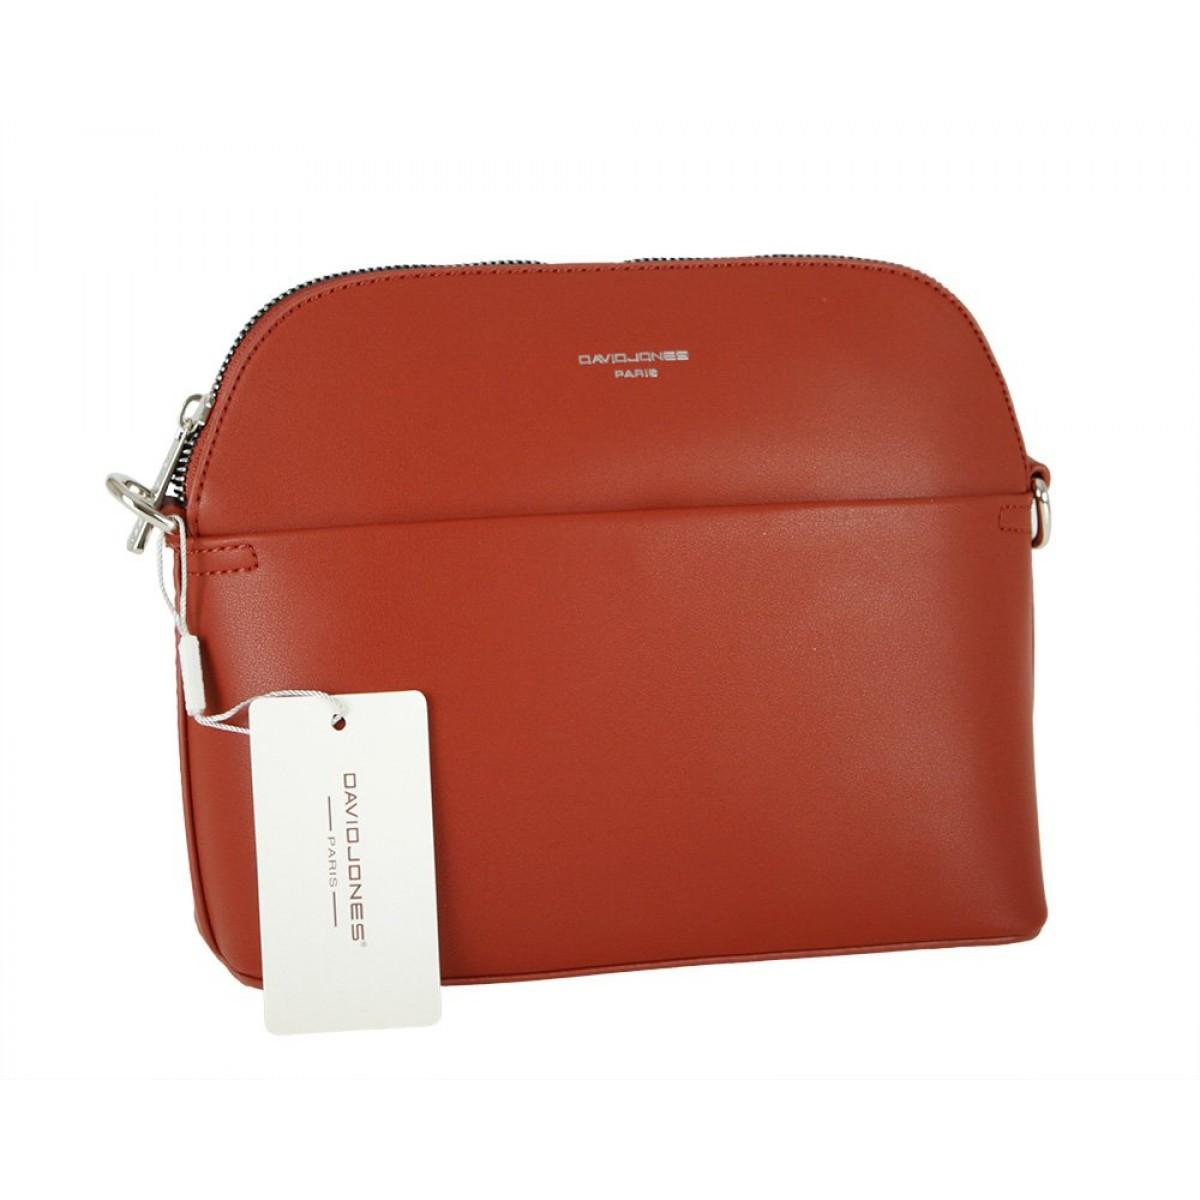 Жіноча сумка David Jones CM5881 SIENNA